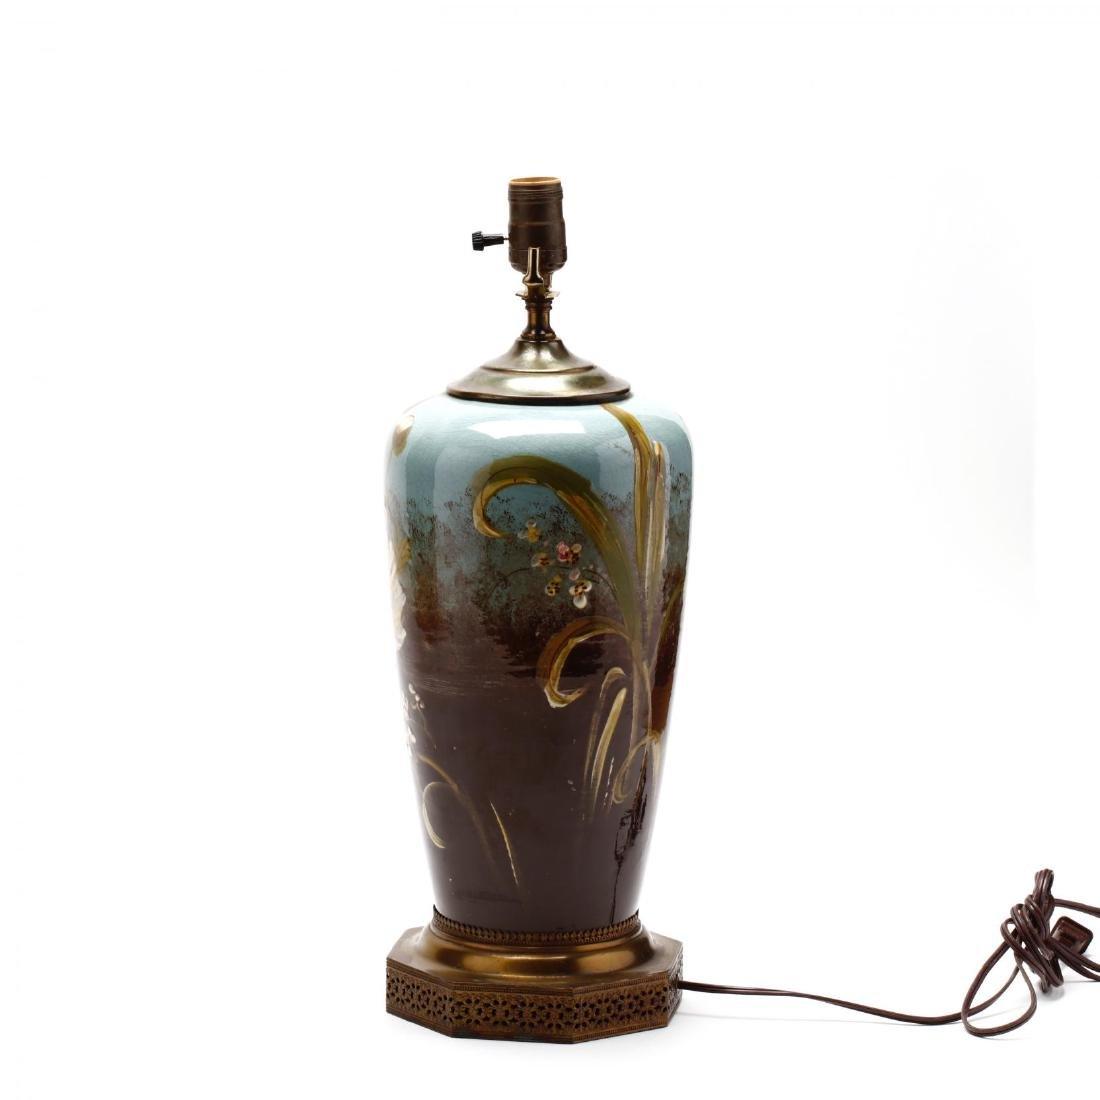 Vintage Art Pottery Lamp - 5